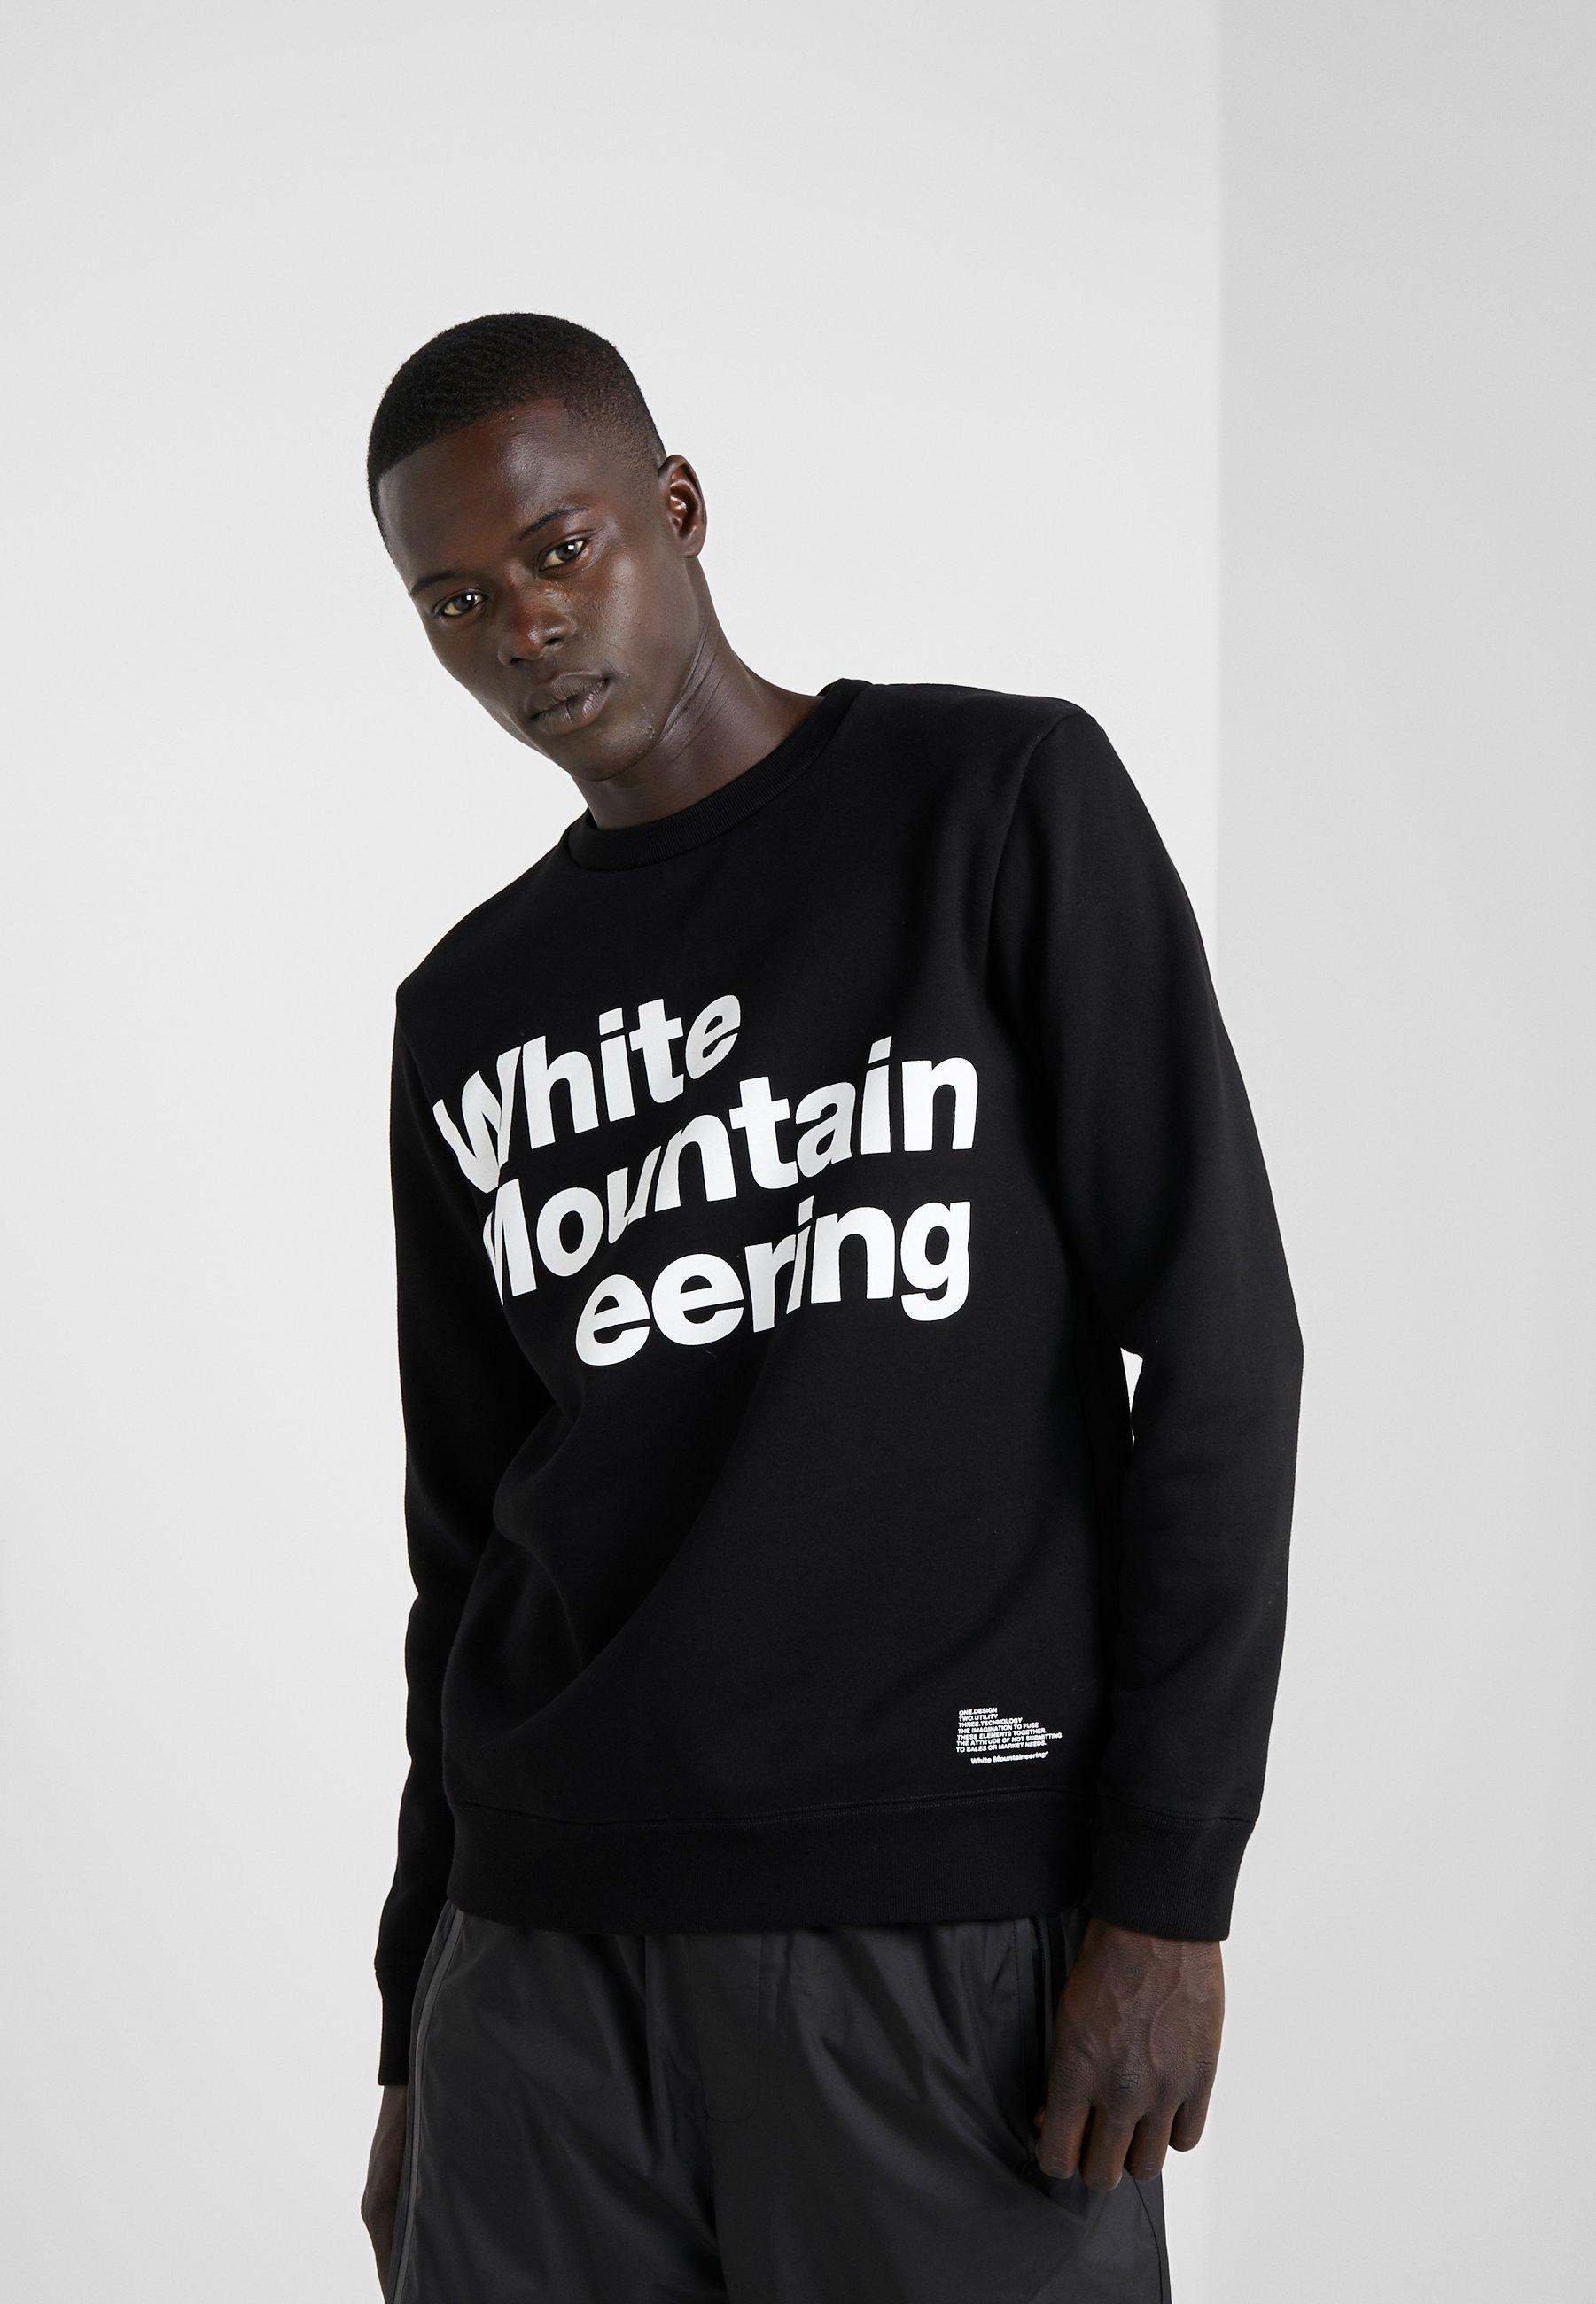 Mountaineering Black LogoSweatshirt Black LogoSweatshirt White LogoSweatshirt White White Black Mountaineering Mountaineering l1F3cTuKJ